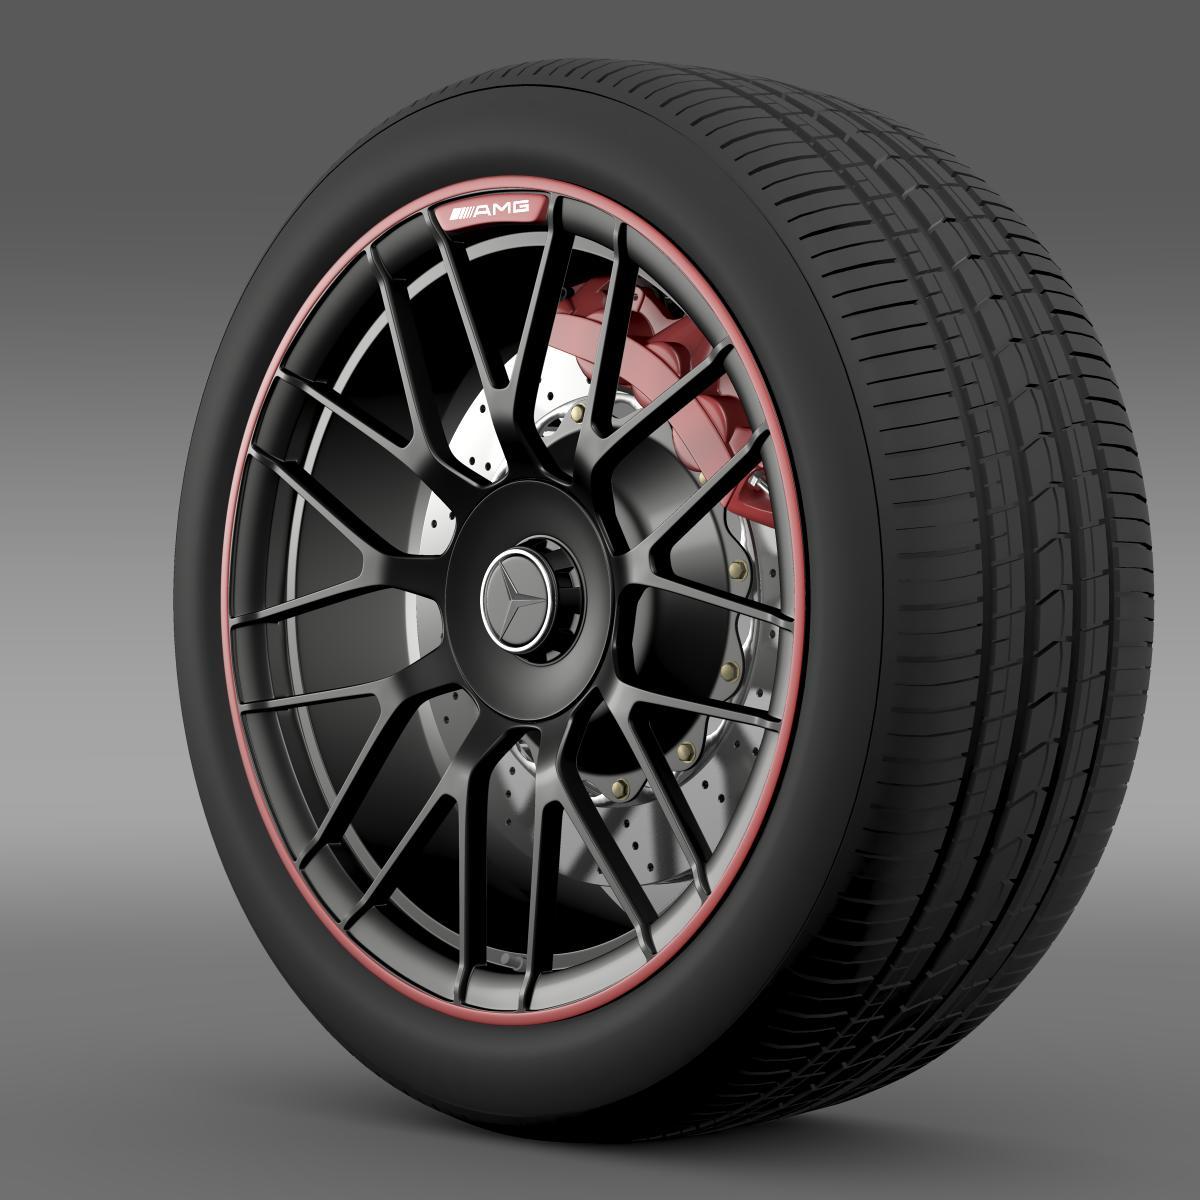 mercedes amg c 63 s edition wheel 3d model 3ds max fbx c4d lwo ma mb hrc xsi obj 210742